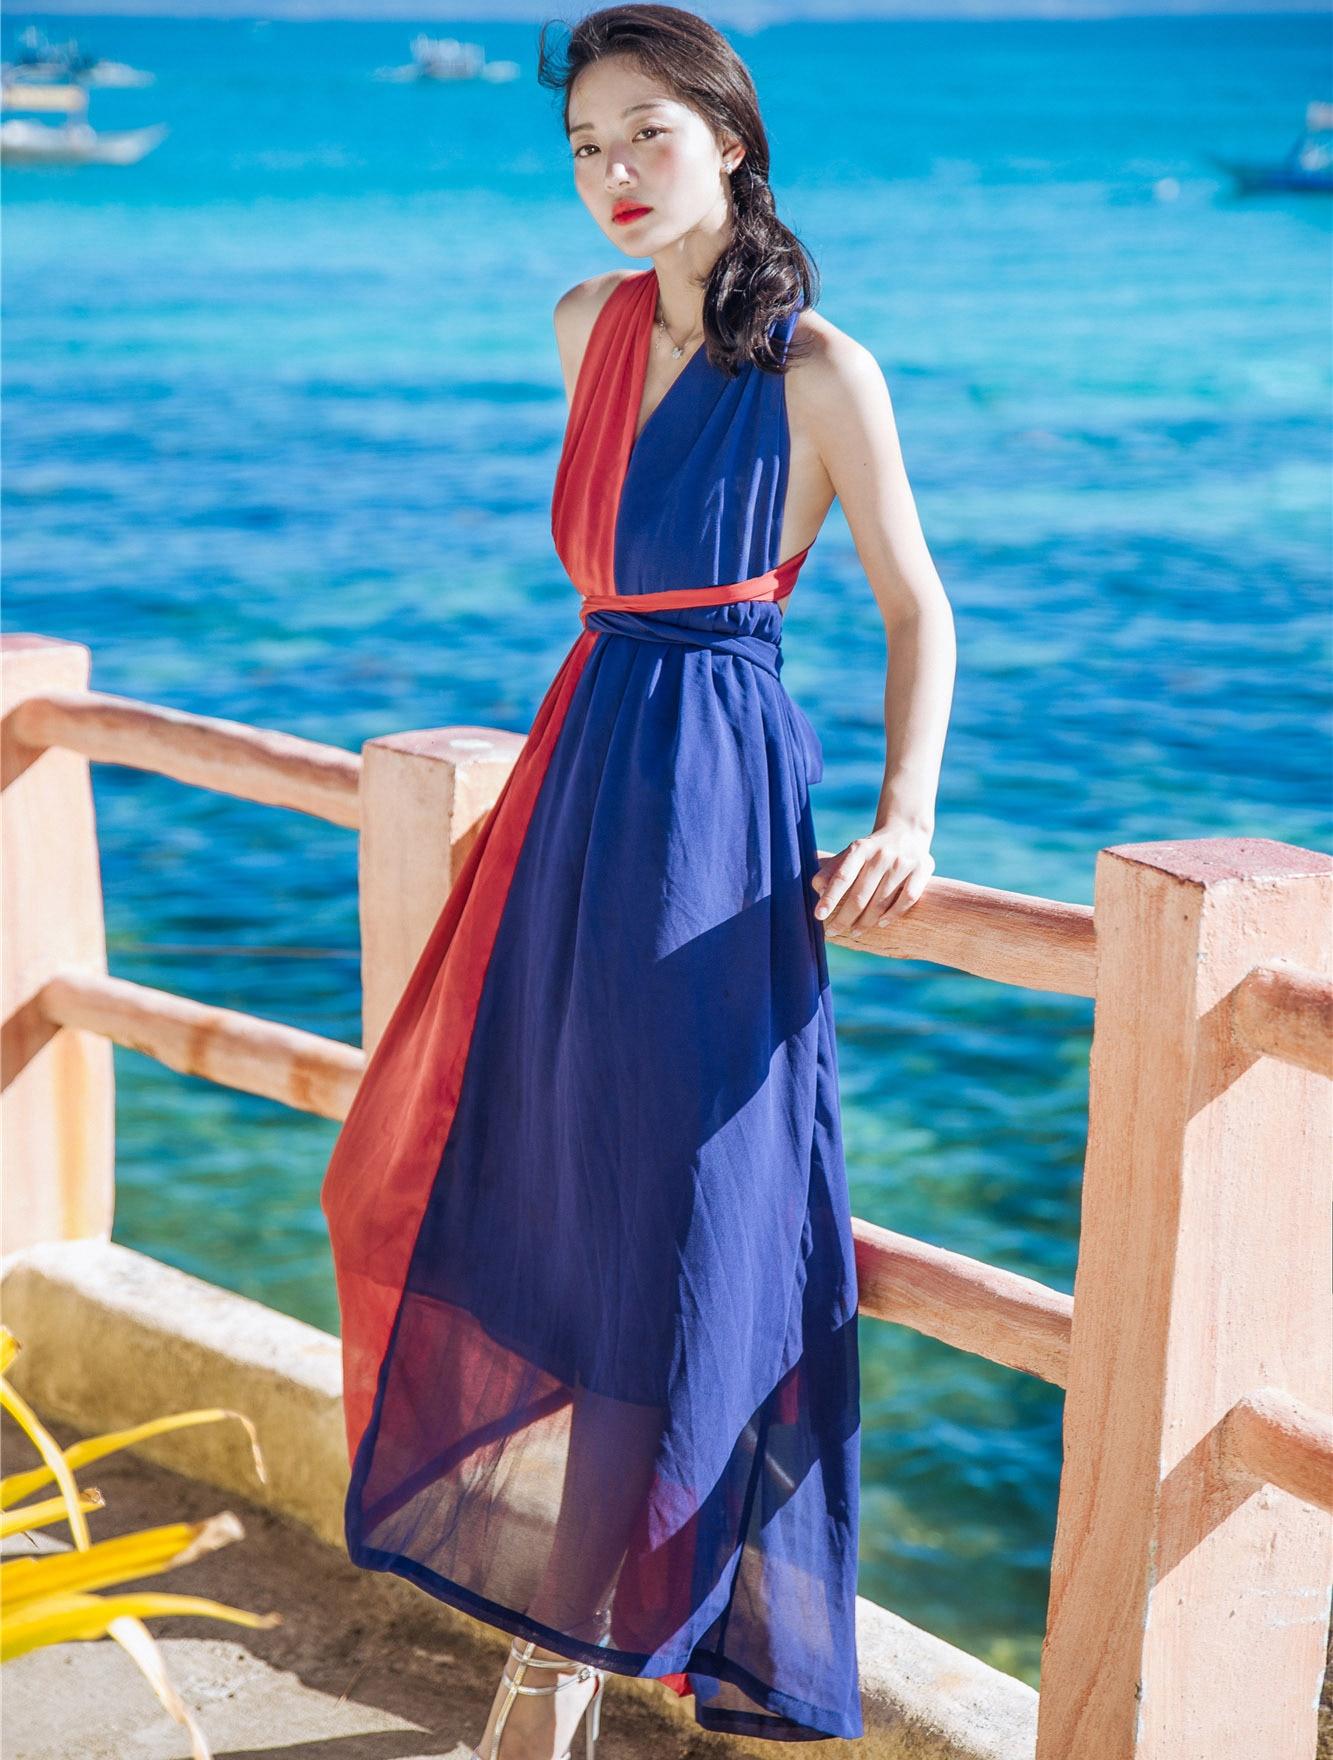 2017 musim panas wanita pantai gaun panjang gaun seksi v neck tanpa lengan merah biru Patchwork Backless Bohemin